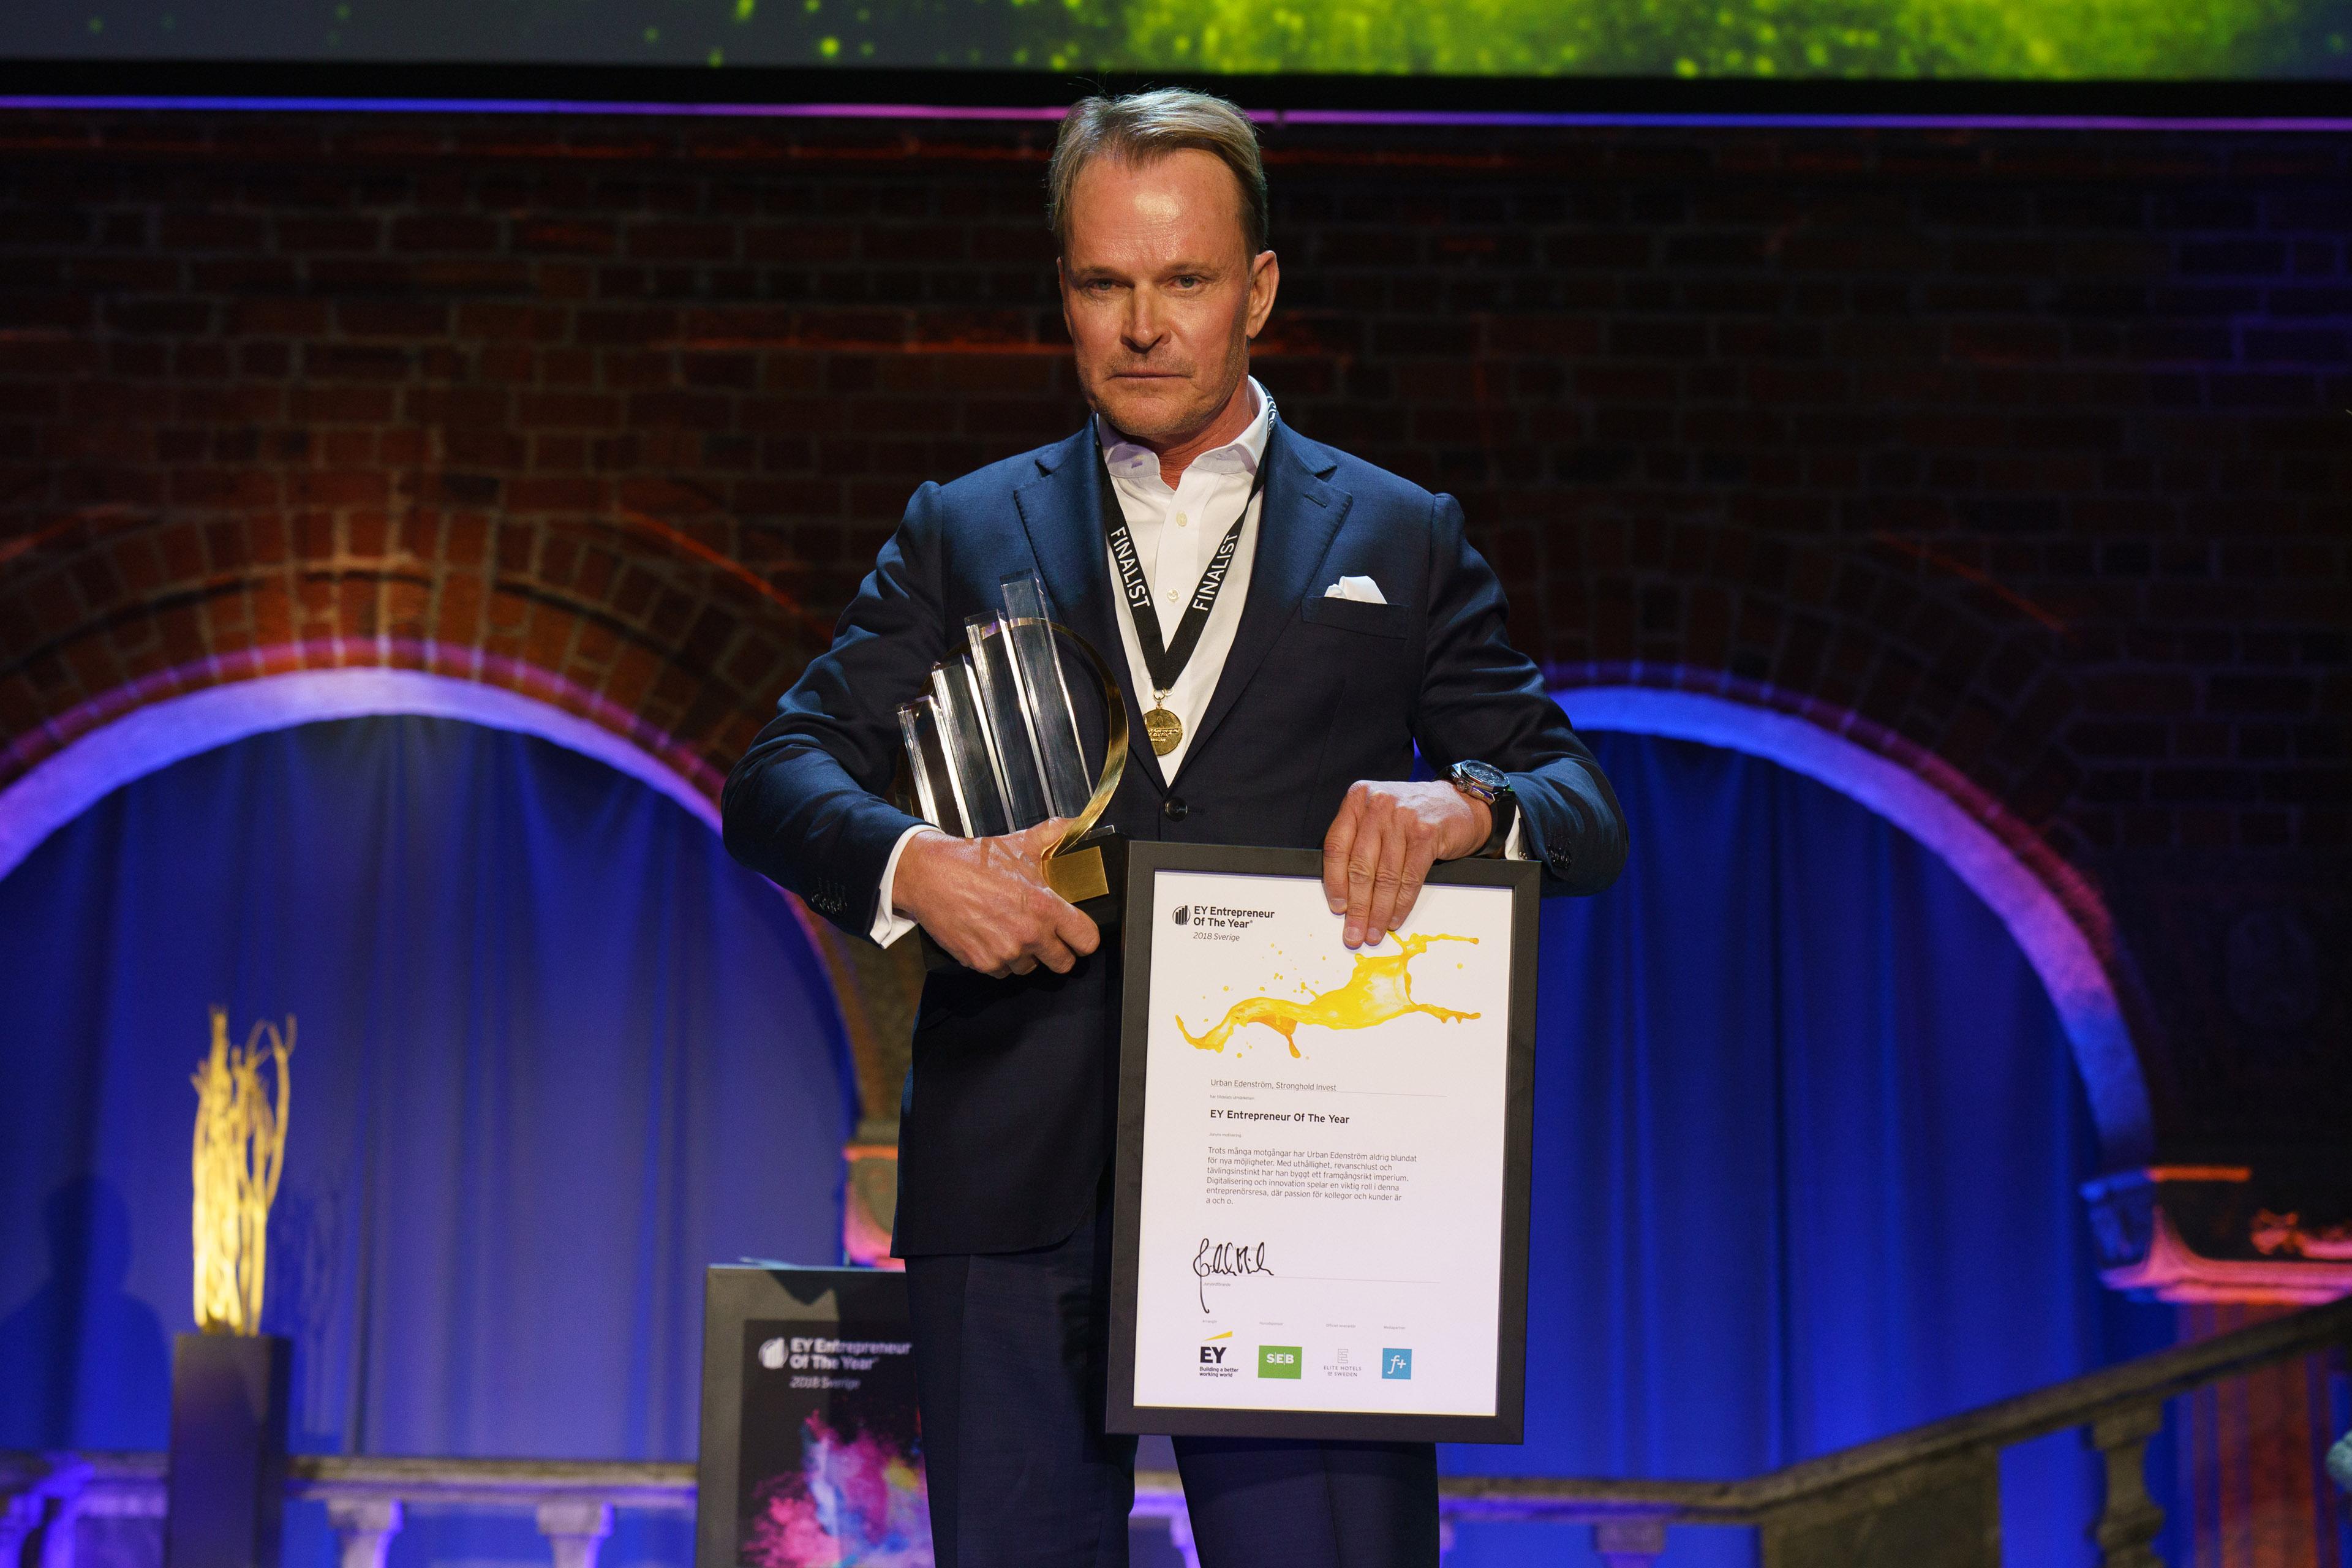 2019 Entrepreneur Urban Edenström